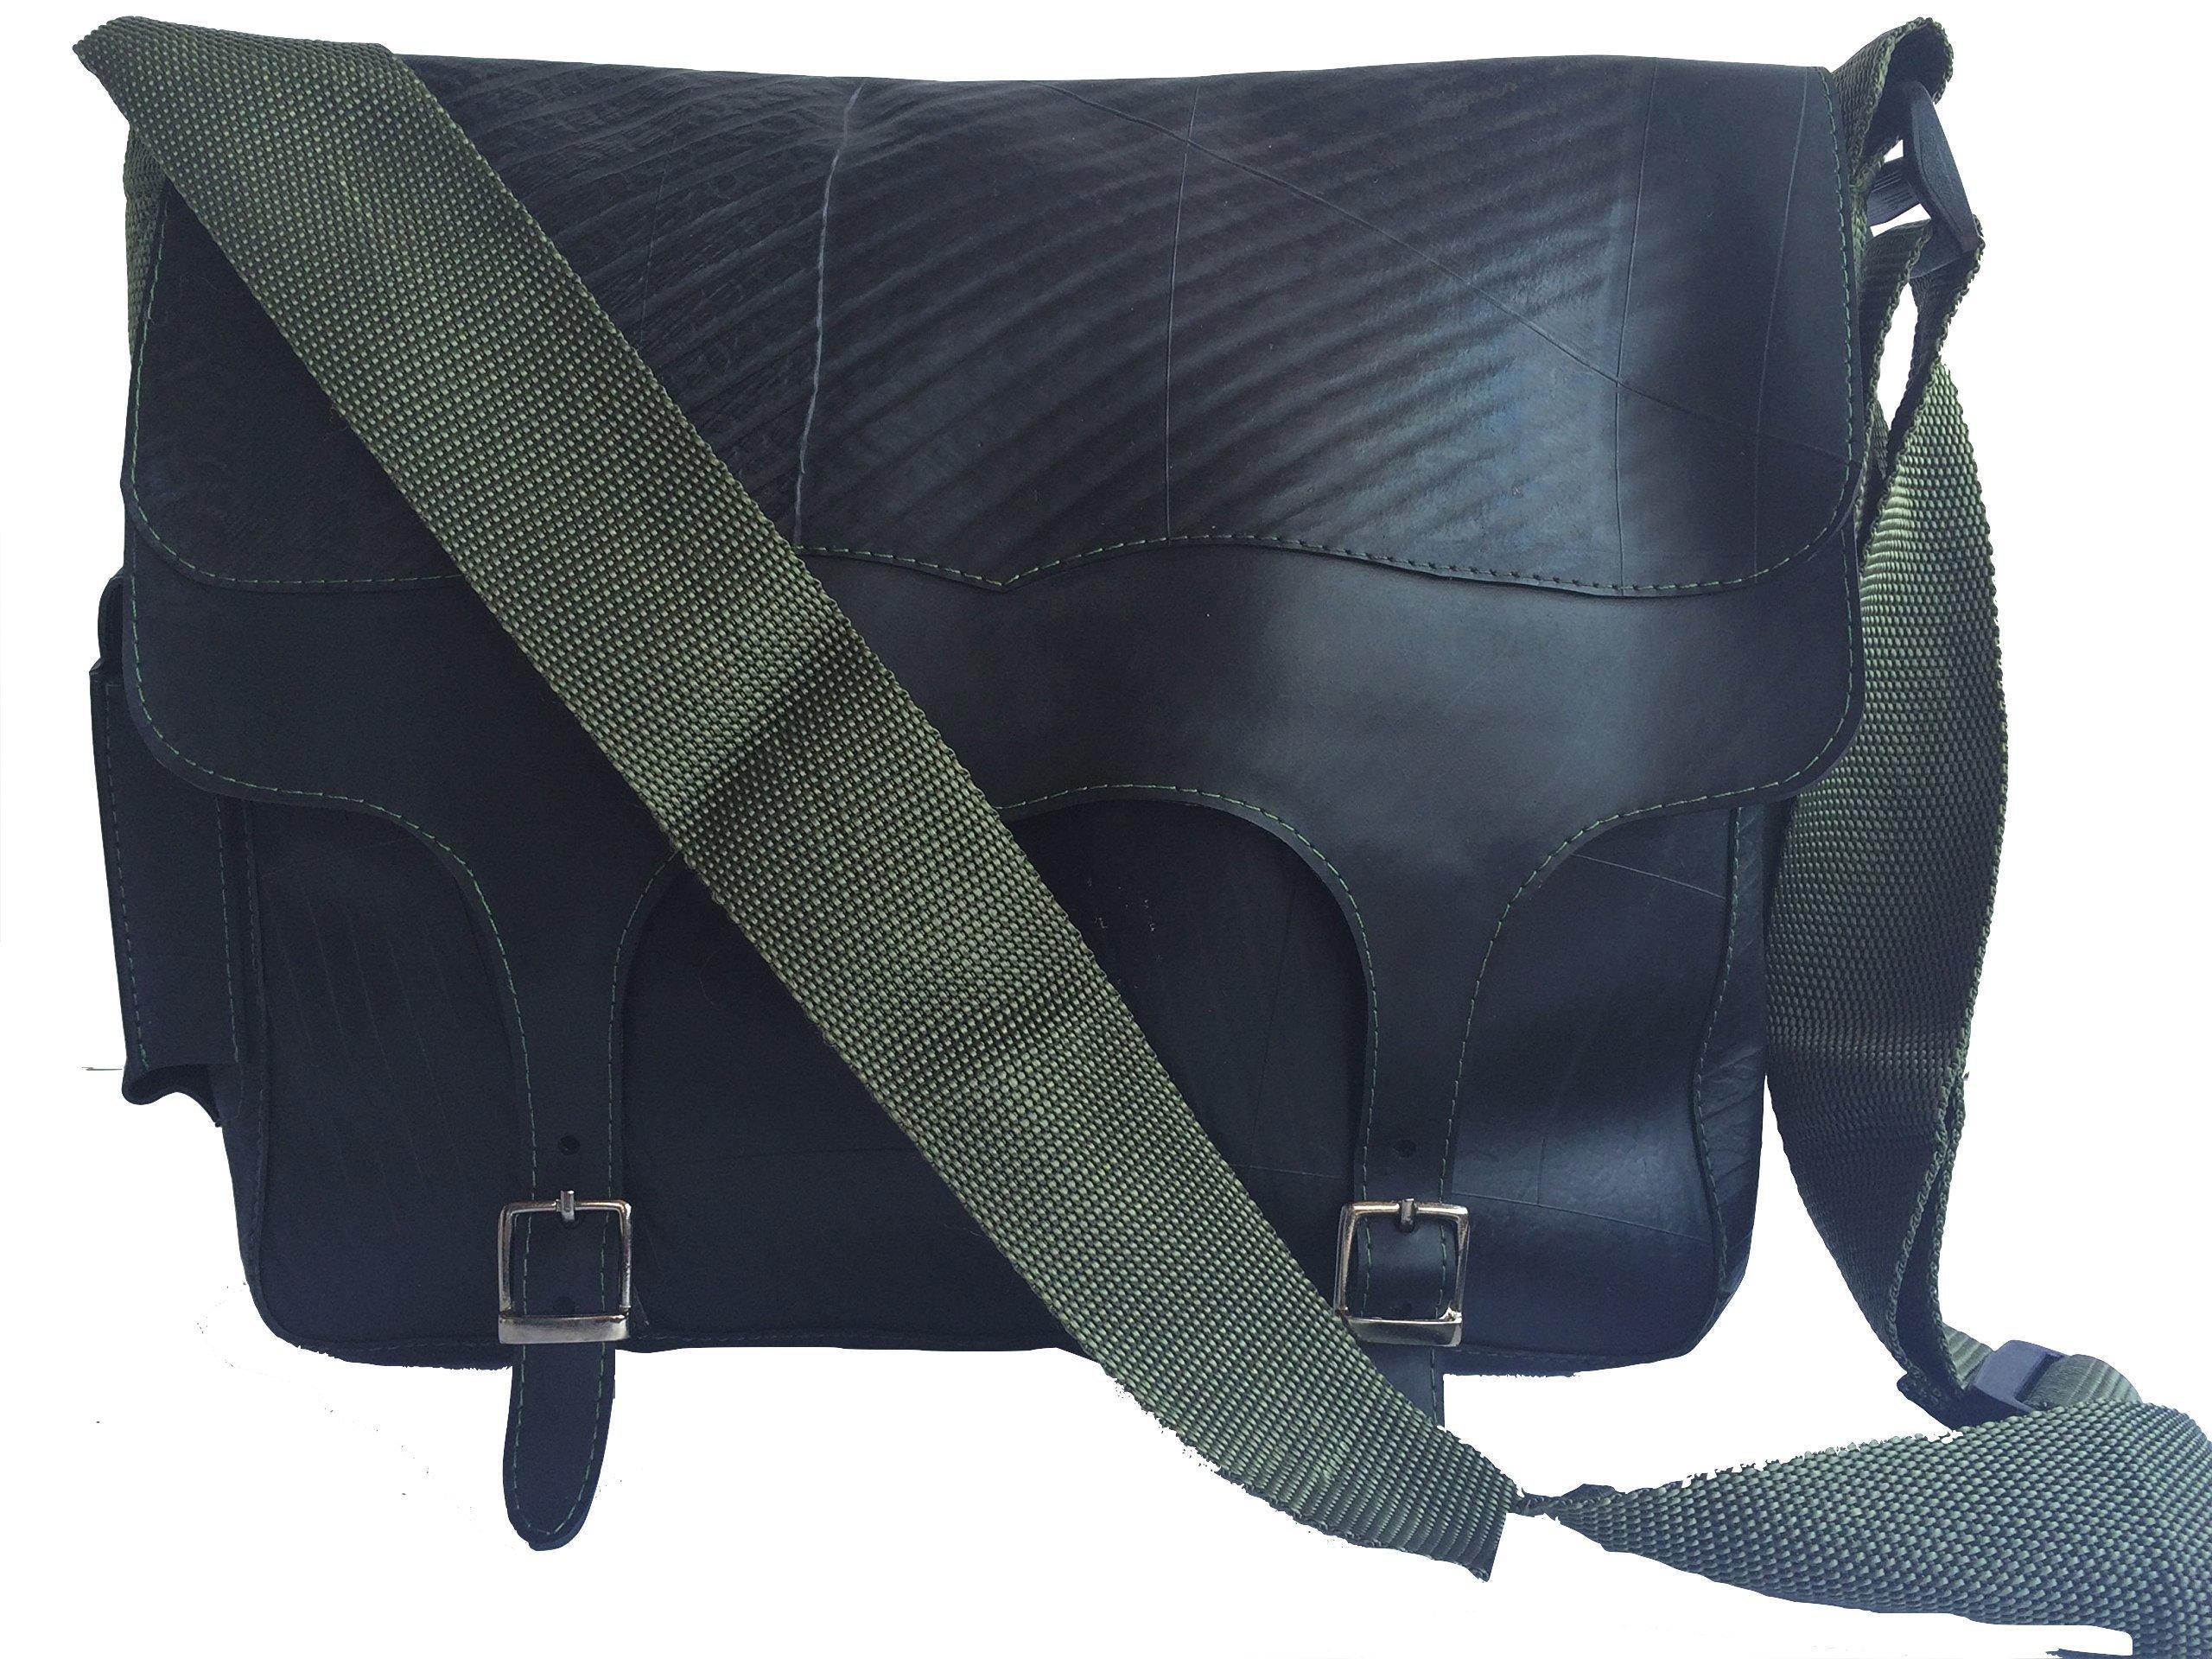 Recycled Rubber shoulder bag Memo - handmade-bags